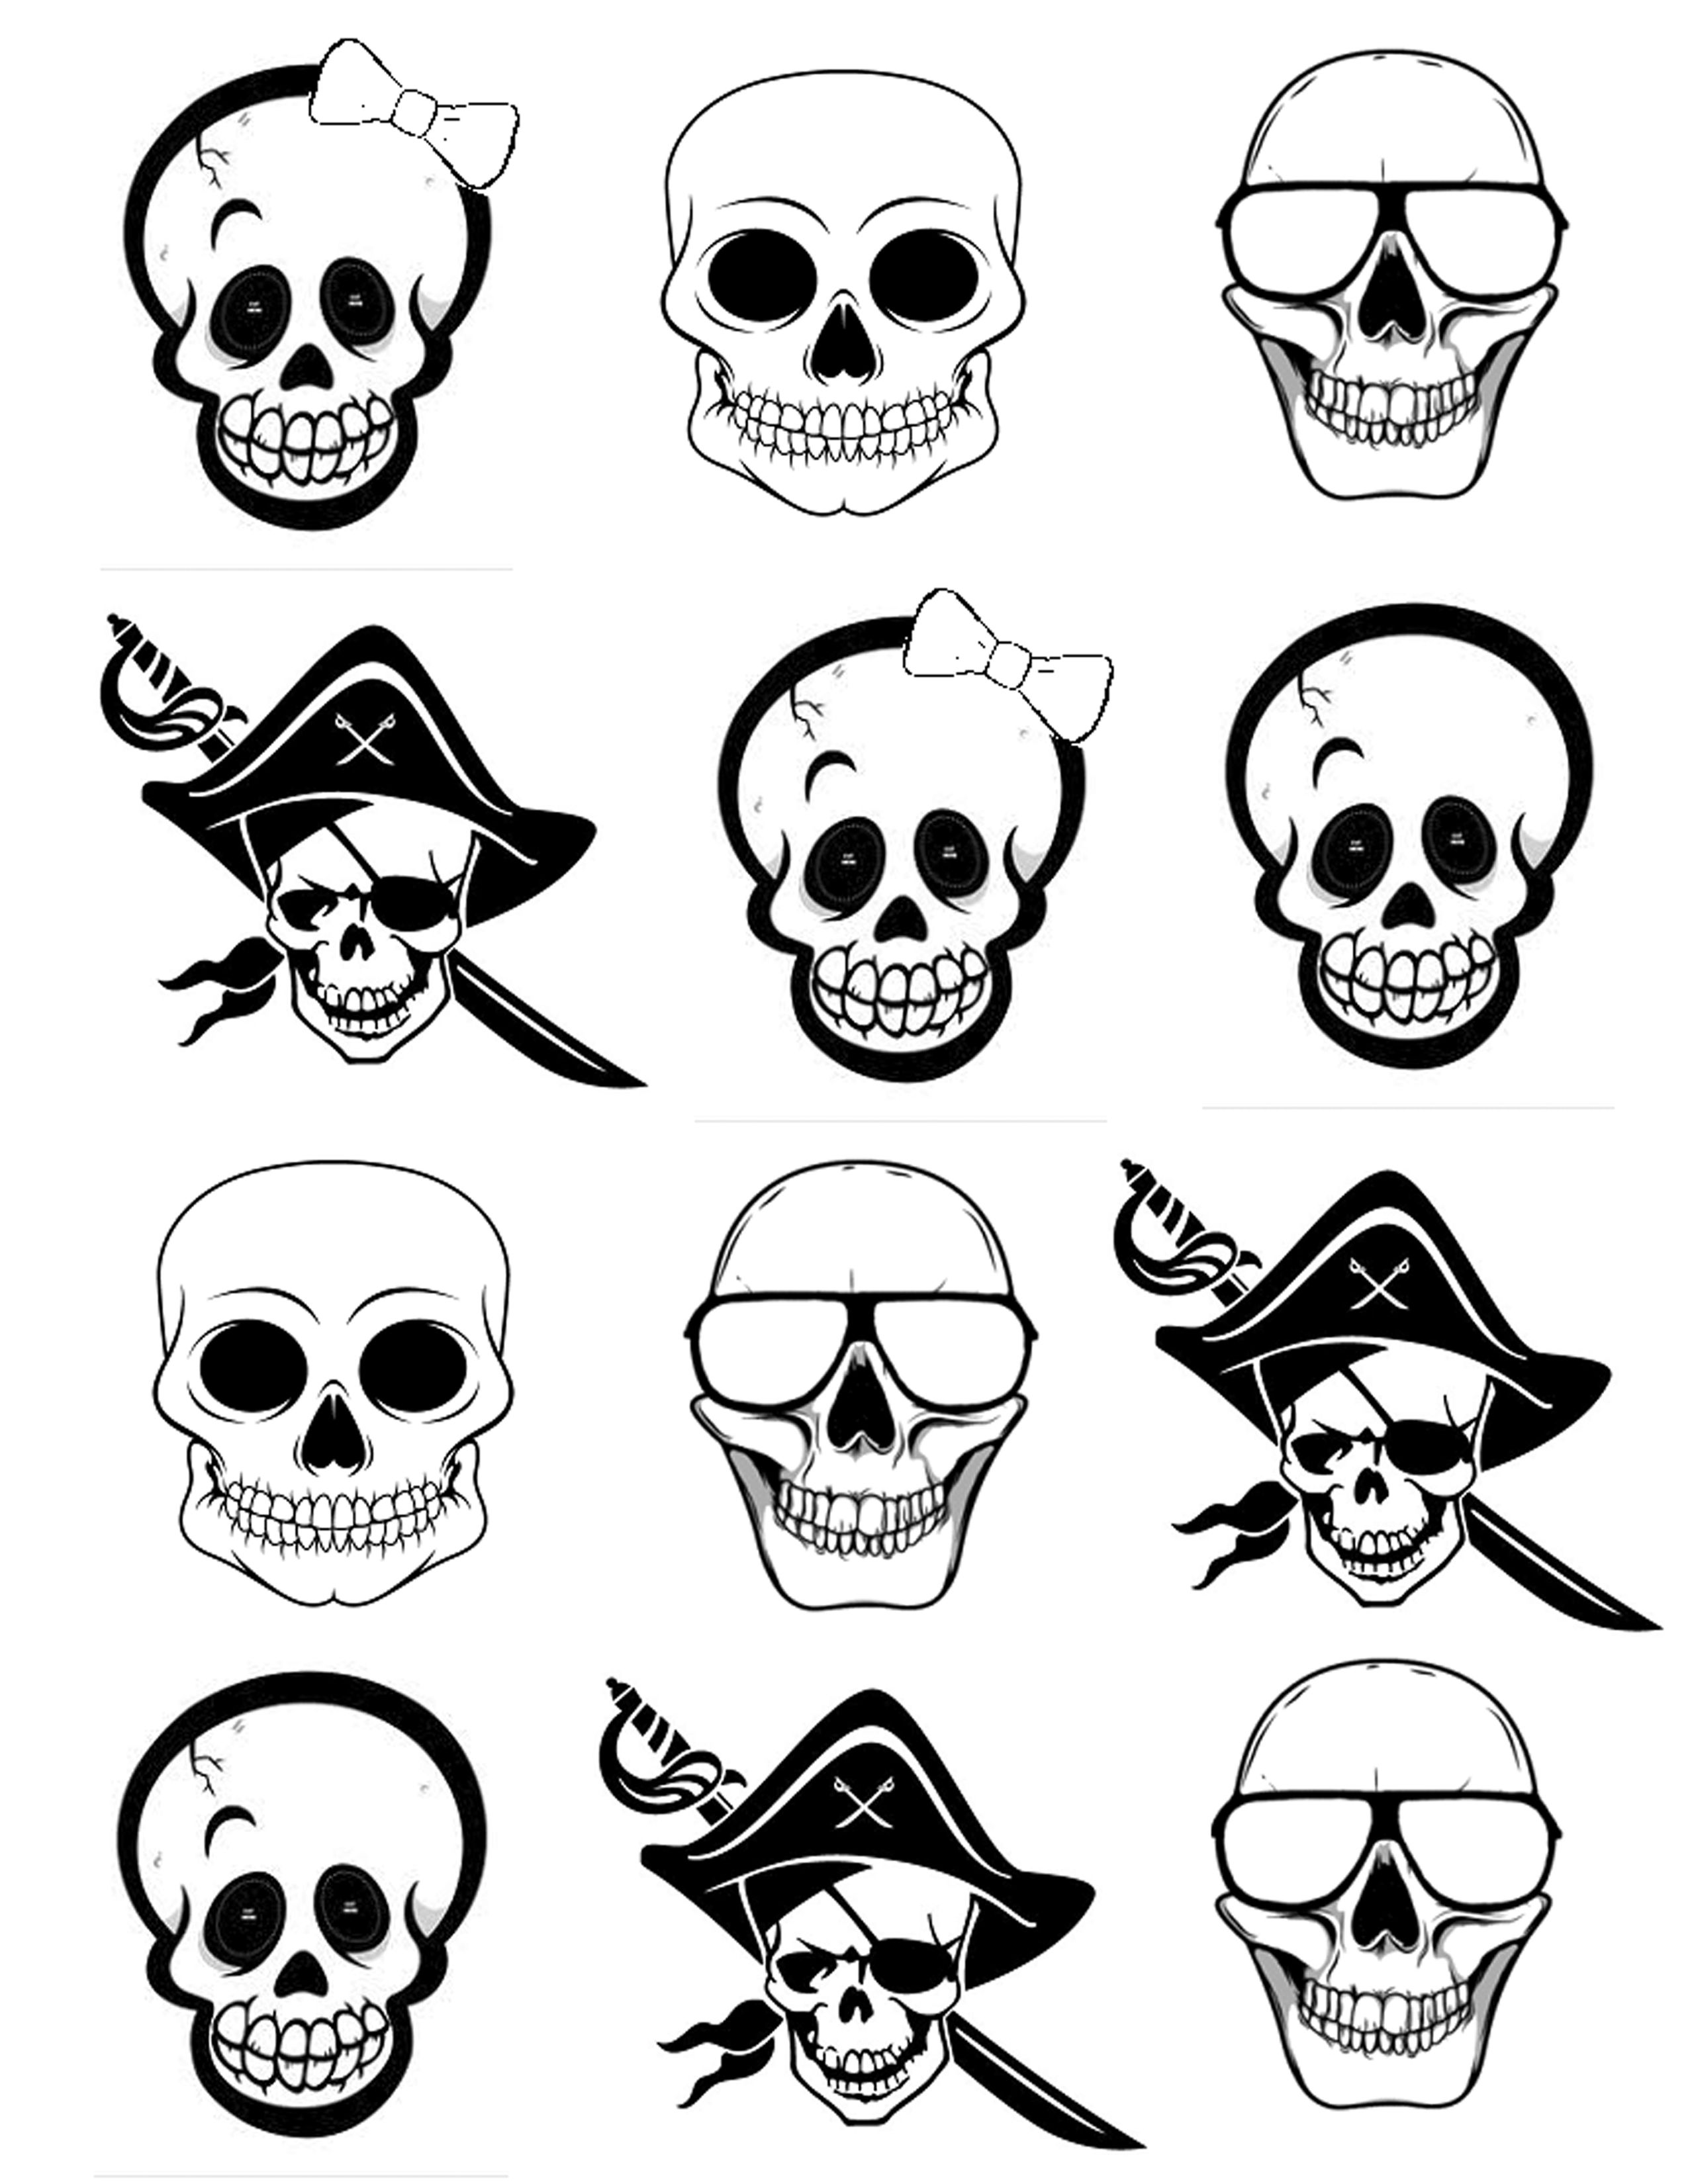 Skeleton Faces for Q-Tip Skeletons - Each kid can make their own skeleton to